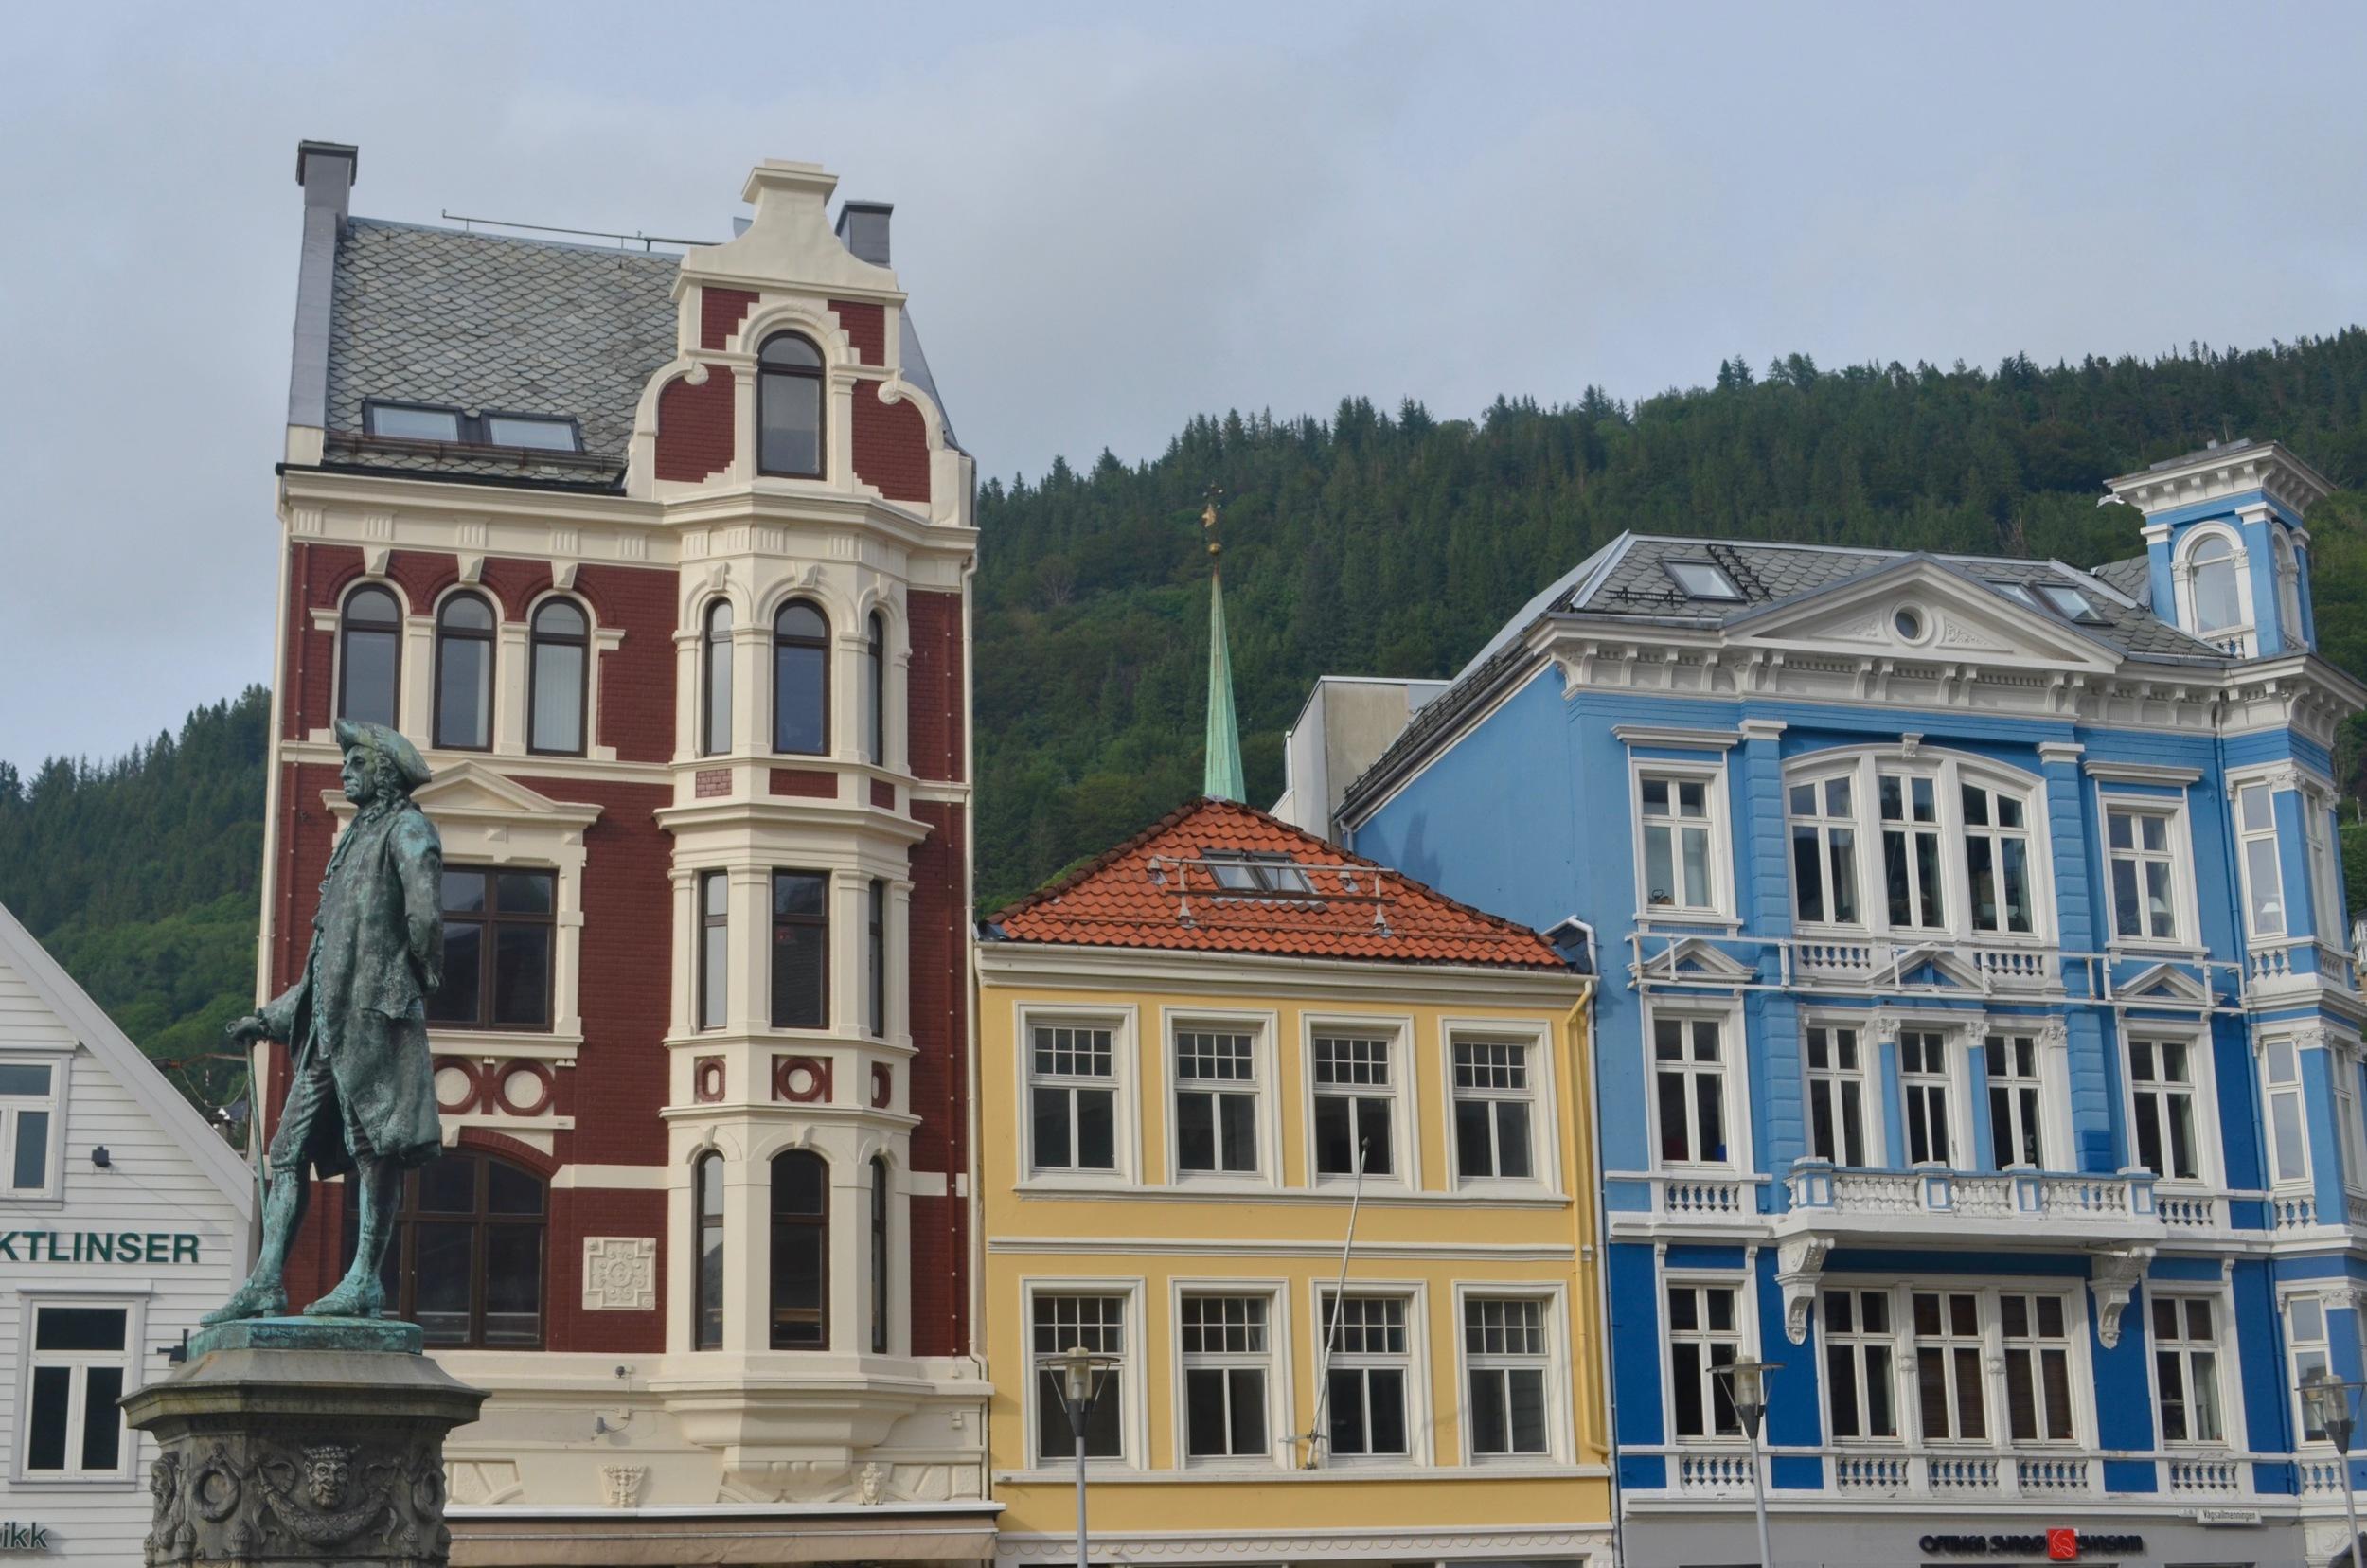 Bergen1.jpg